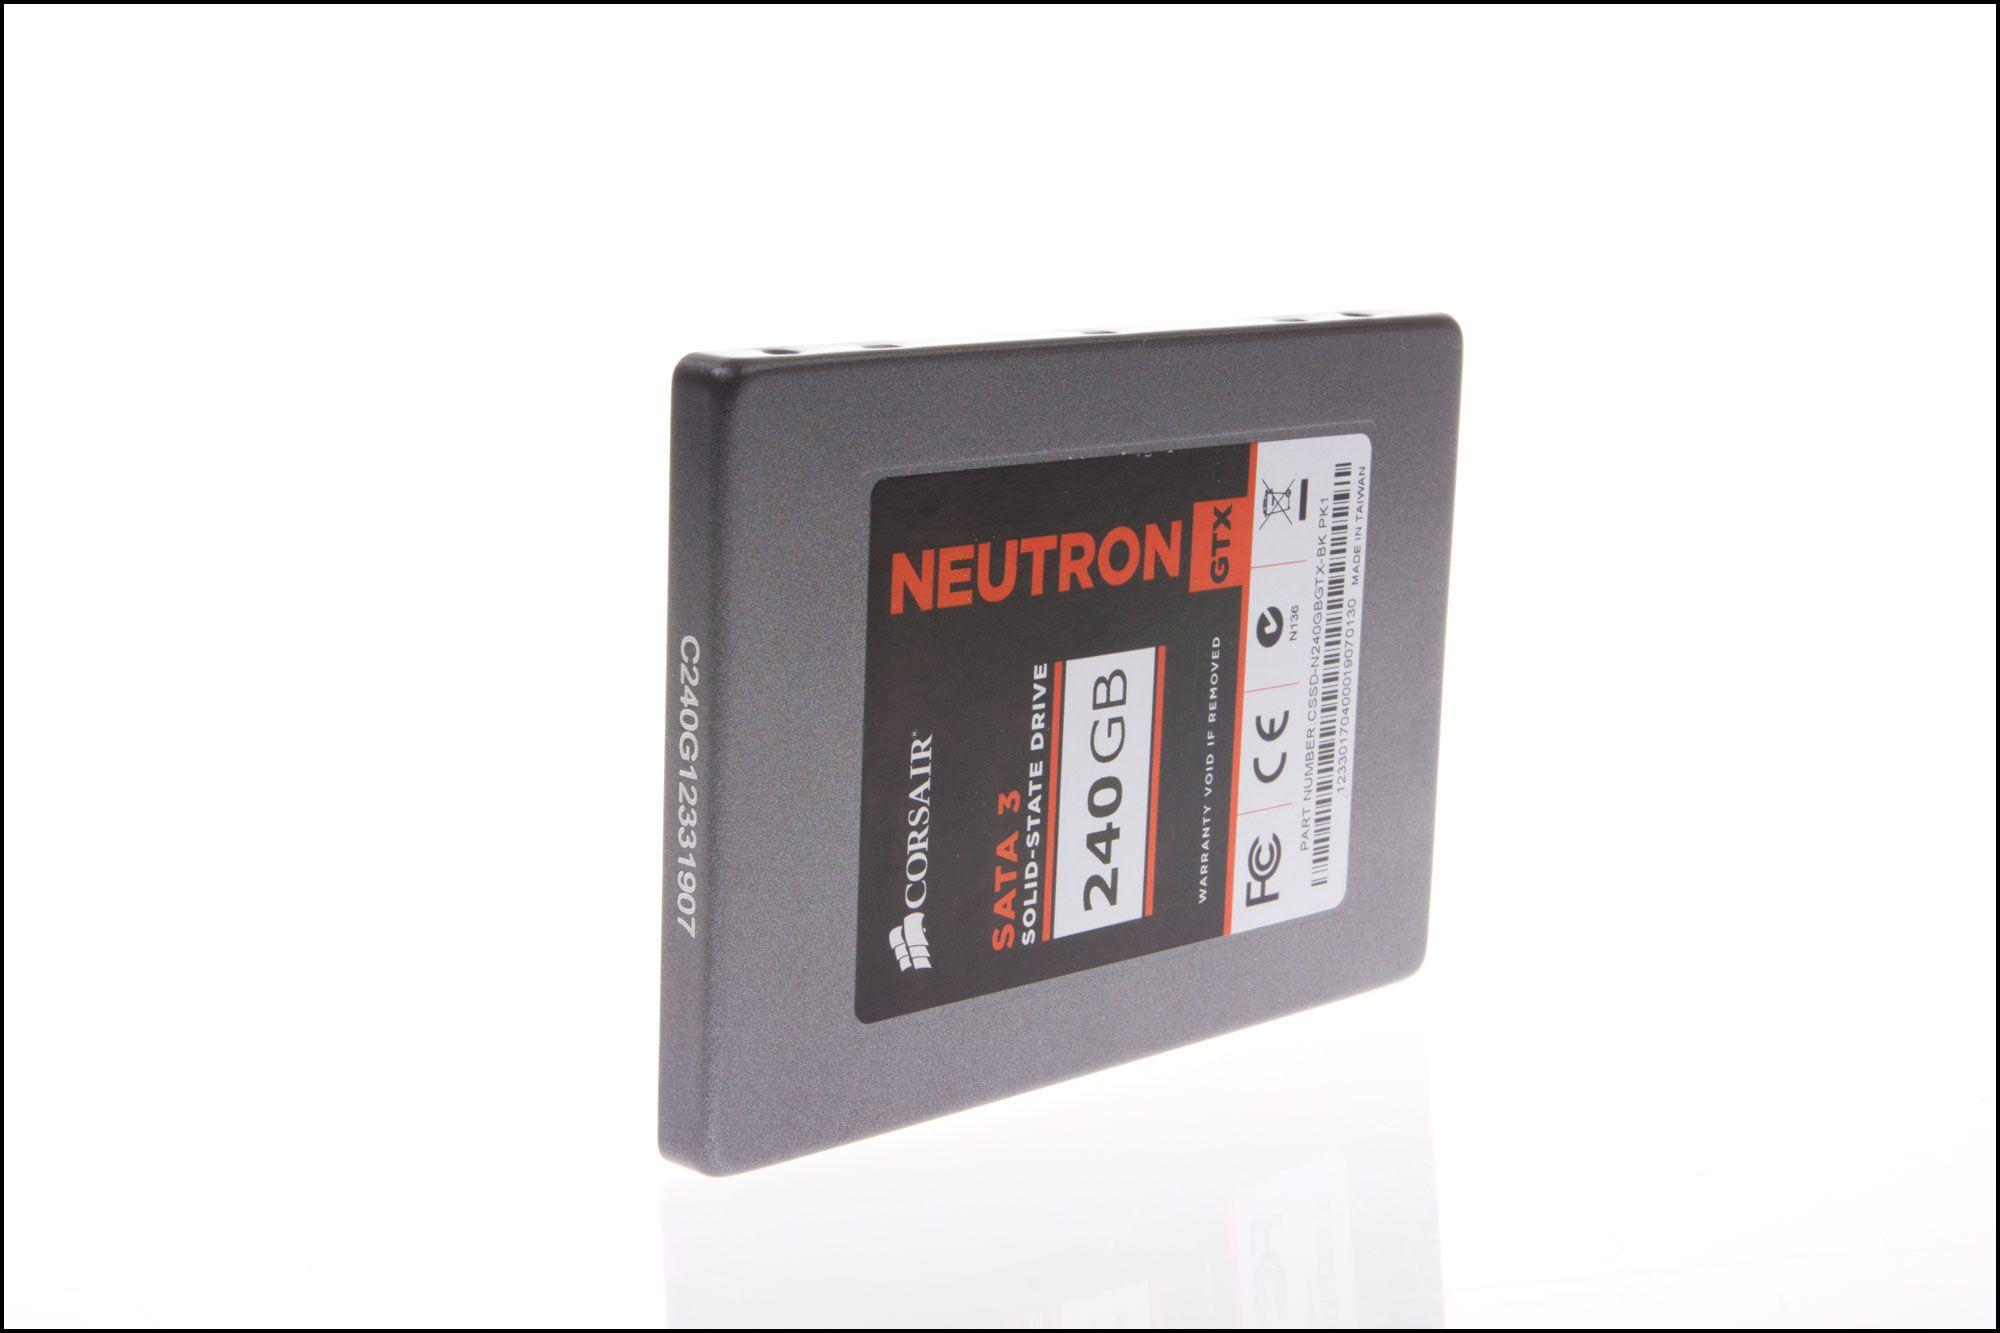 Neutron GTX er bare 7 millimeter tykk.Foto: Jørgen Elton Nilsen, Hardware.no